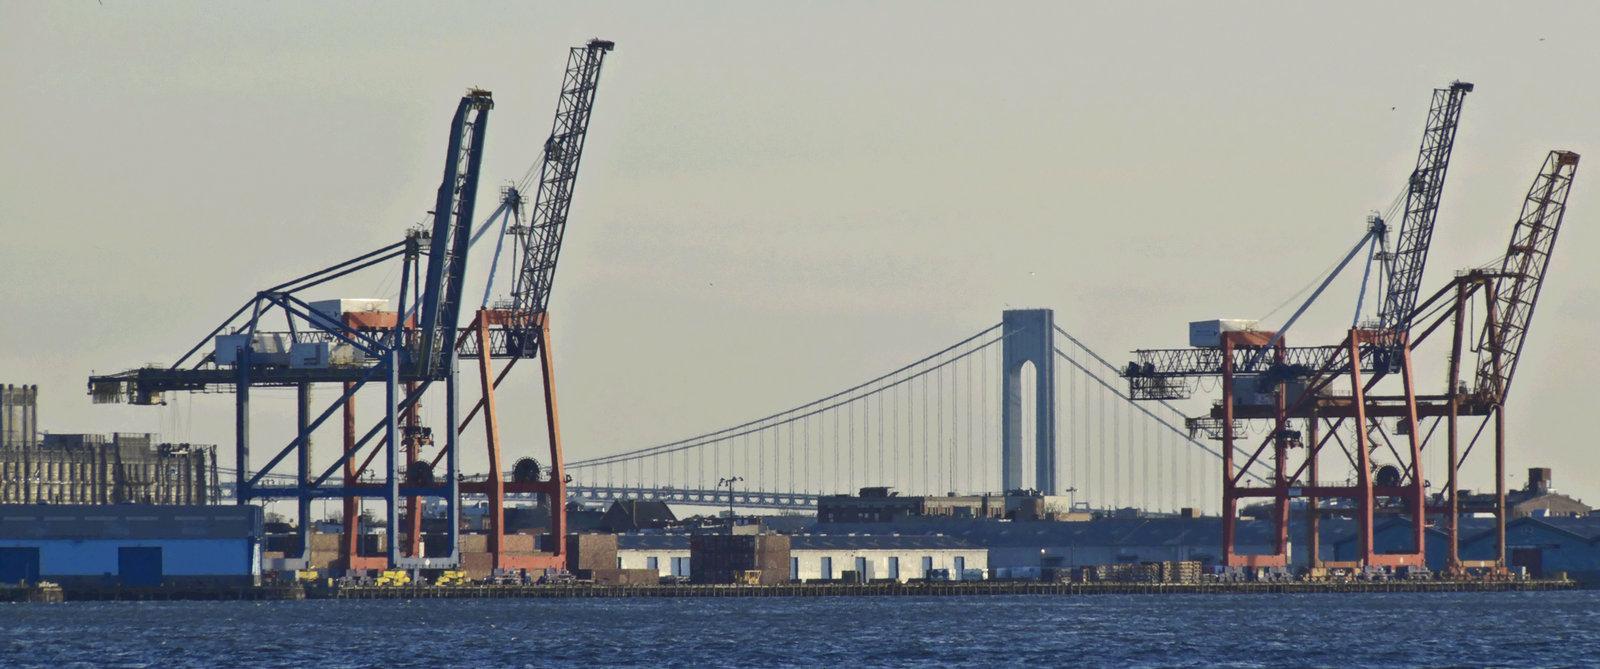 Prince's Bay Staten Island, NY Private Investigator